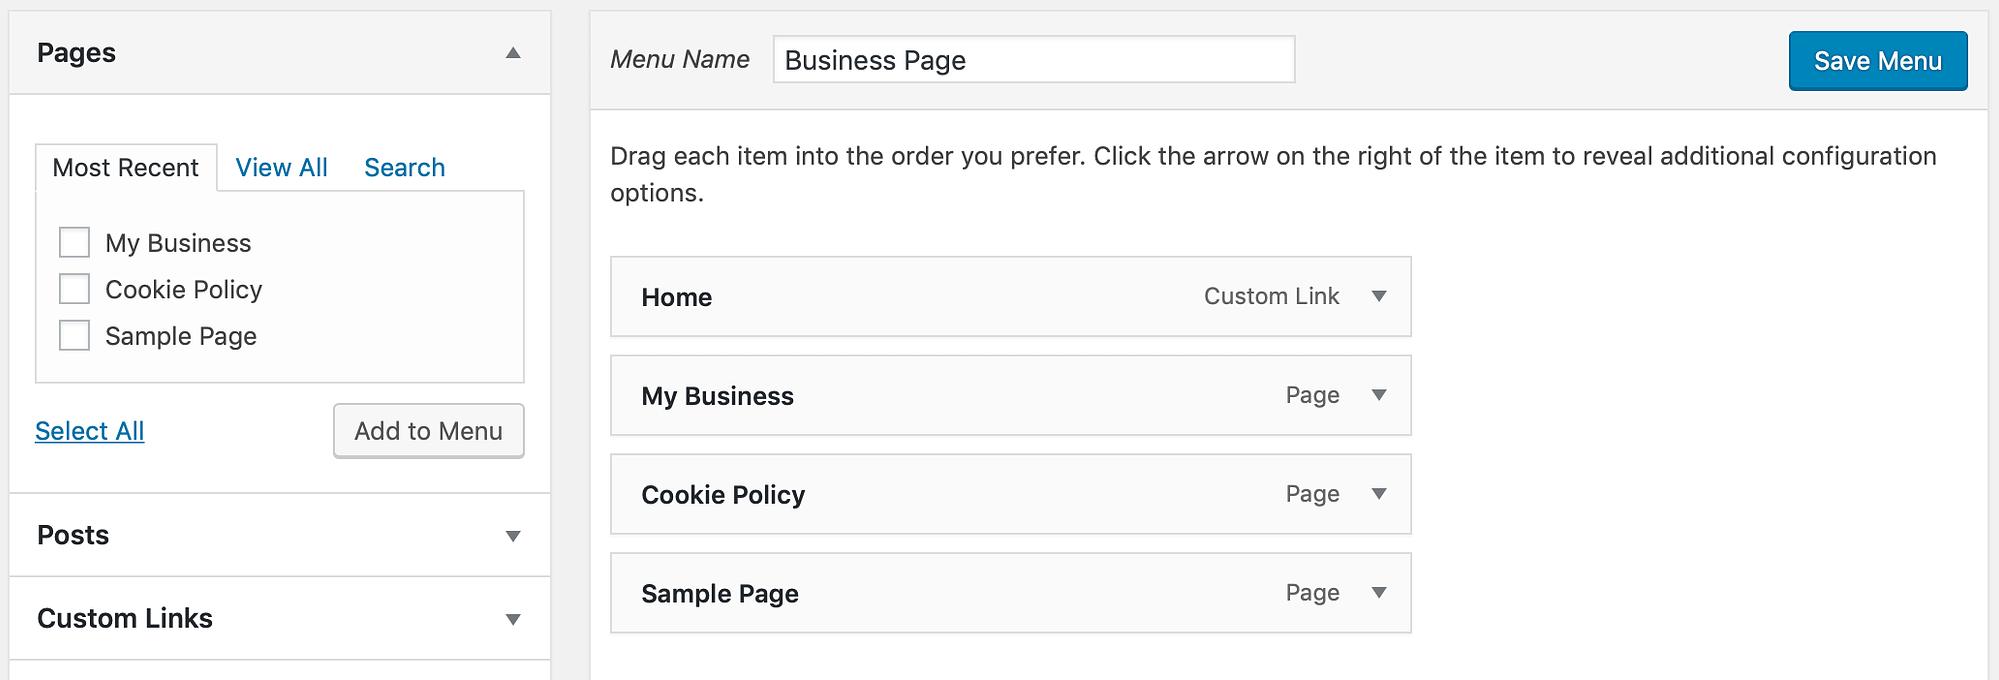 Some menu options in WordPress.